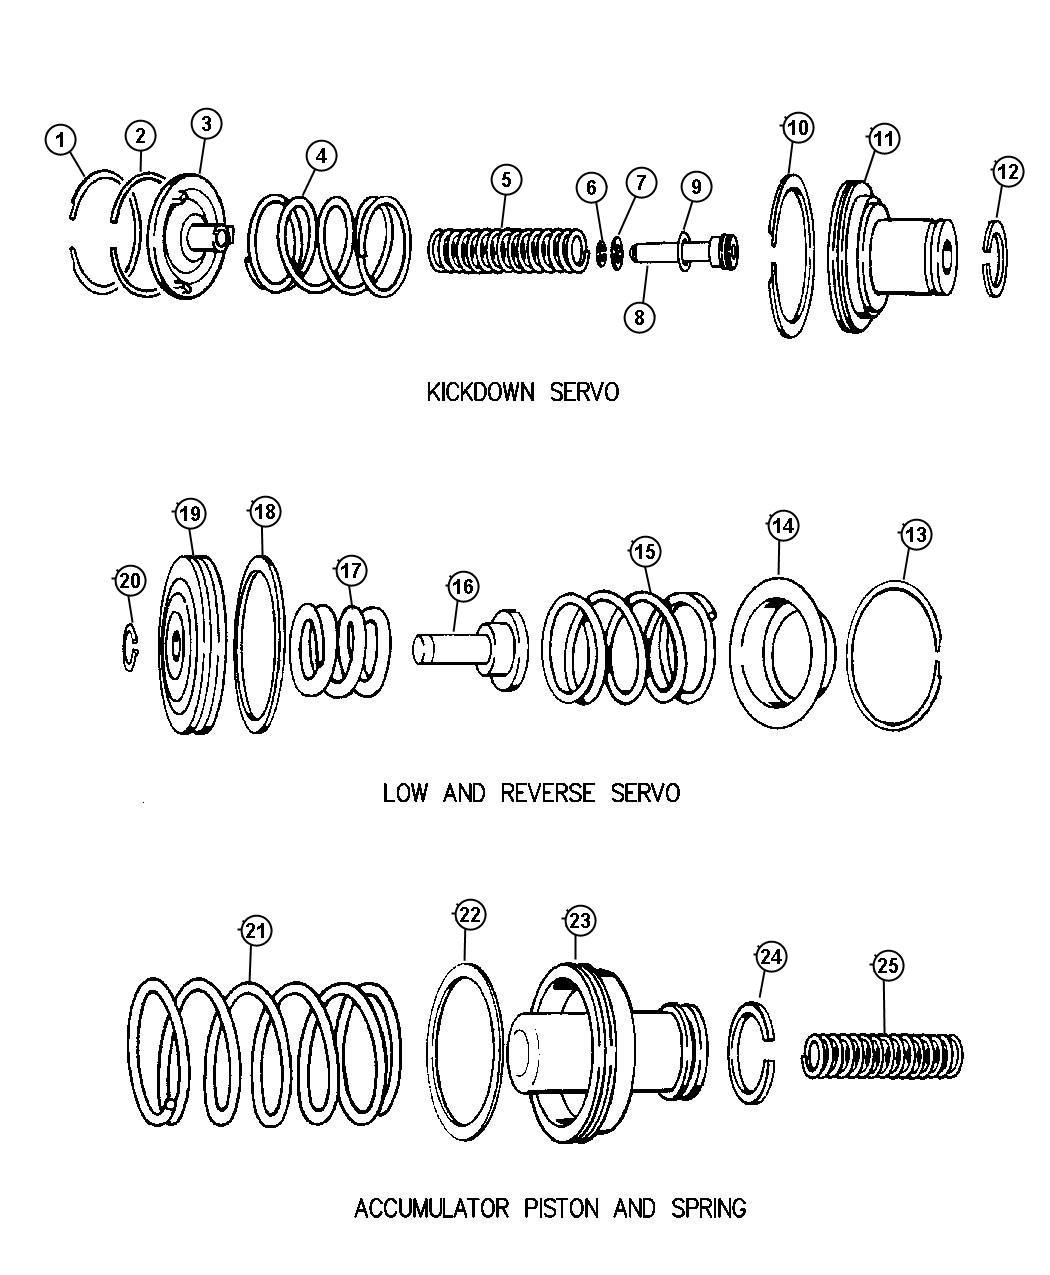 47re Transmission Diagram, 47re, Free Engine Image For